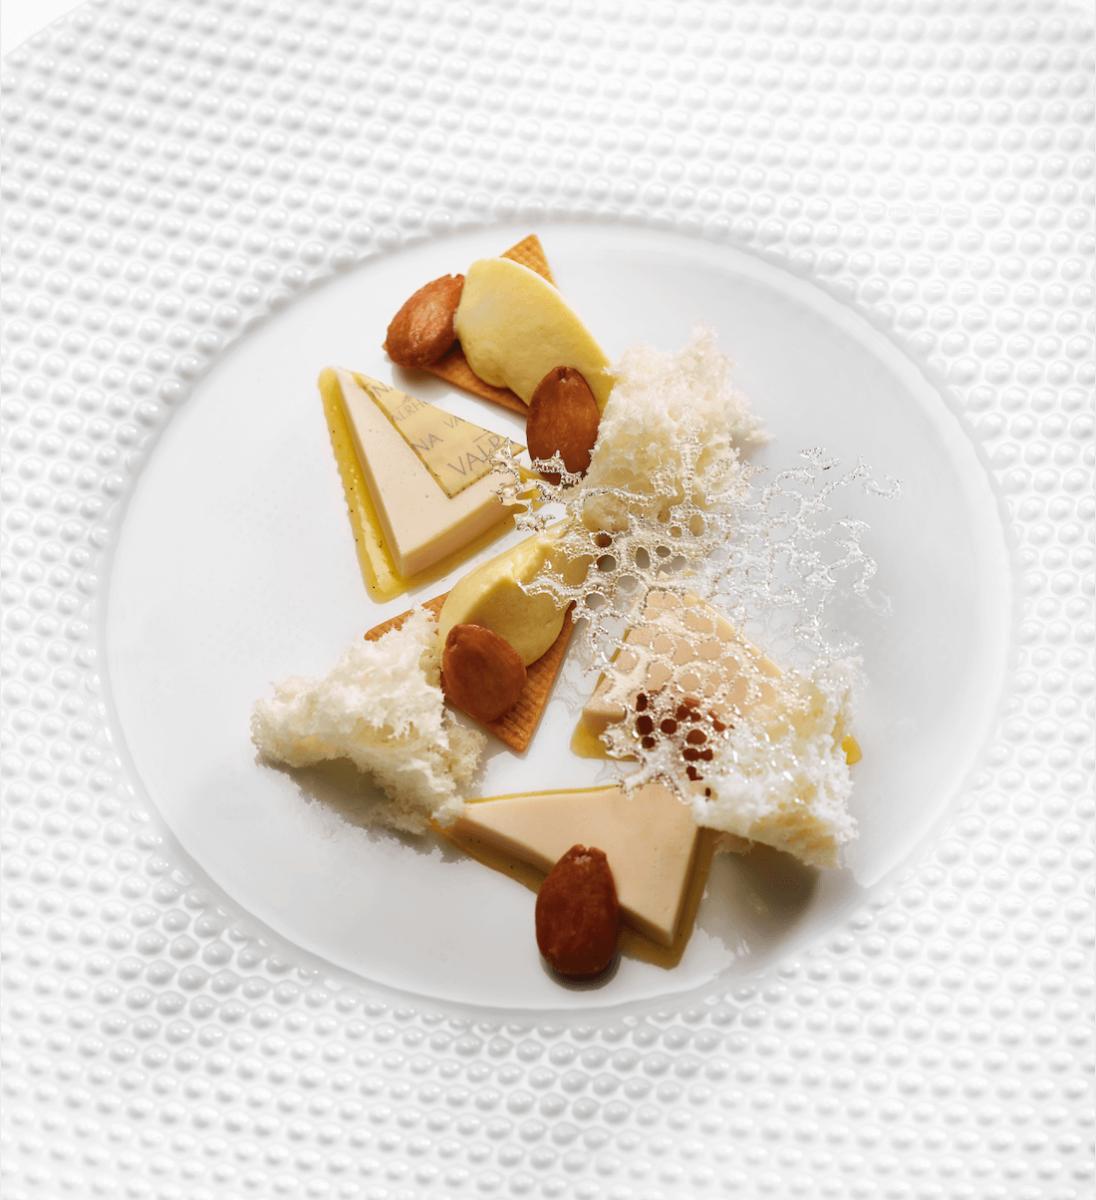 Passion Pêle-Mêle Plated Dessert Recipe